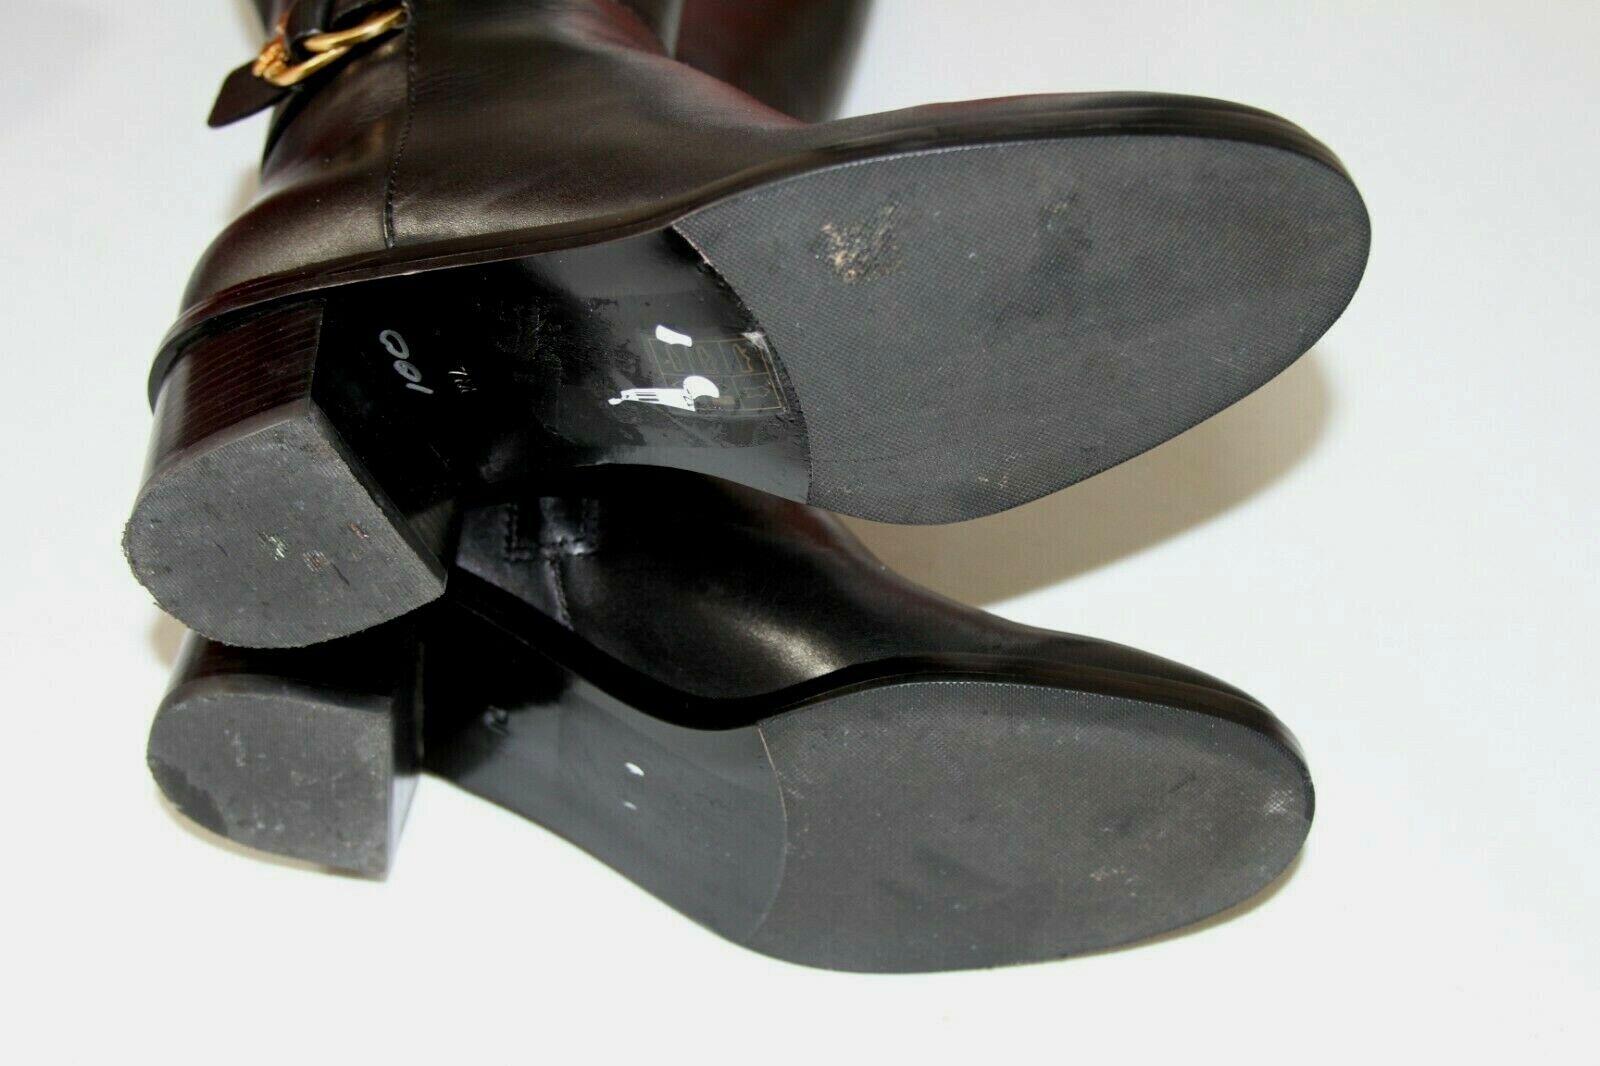 83 TORY BURCH MARSDEN BLACK LEATHER KNEE BOOTS      SZ 7 770963